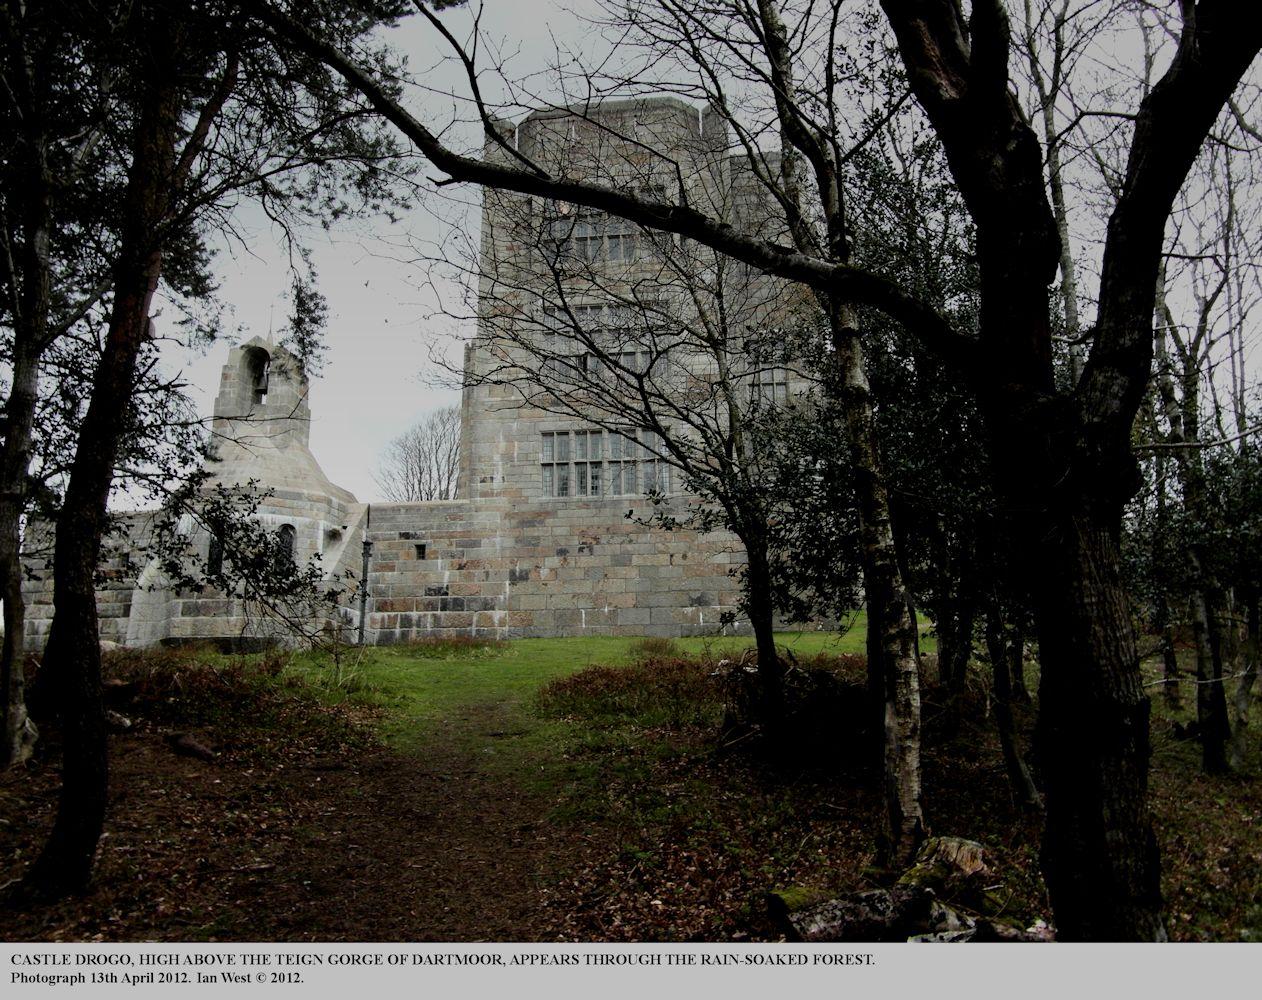 Castle Drogo seen through the forest, Northeast Dartmoor, near Chagford, Devon